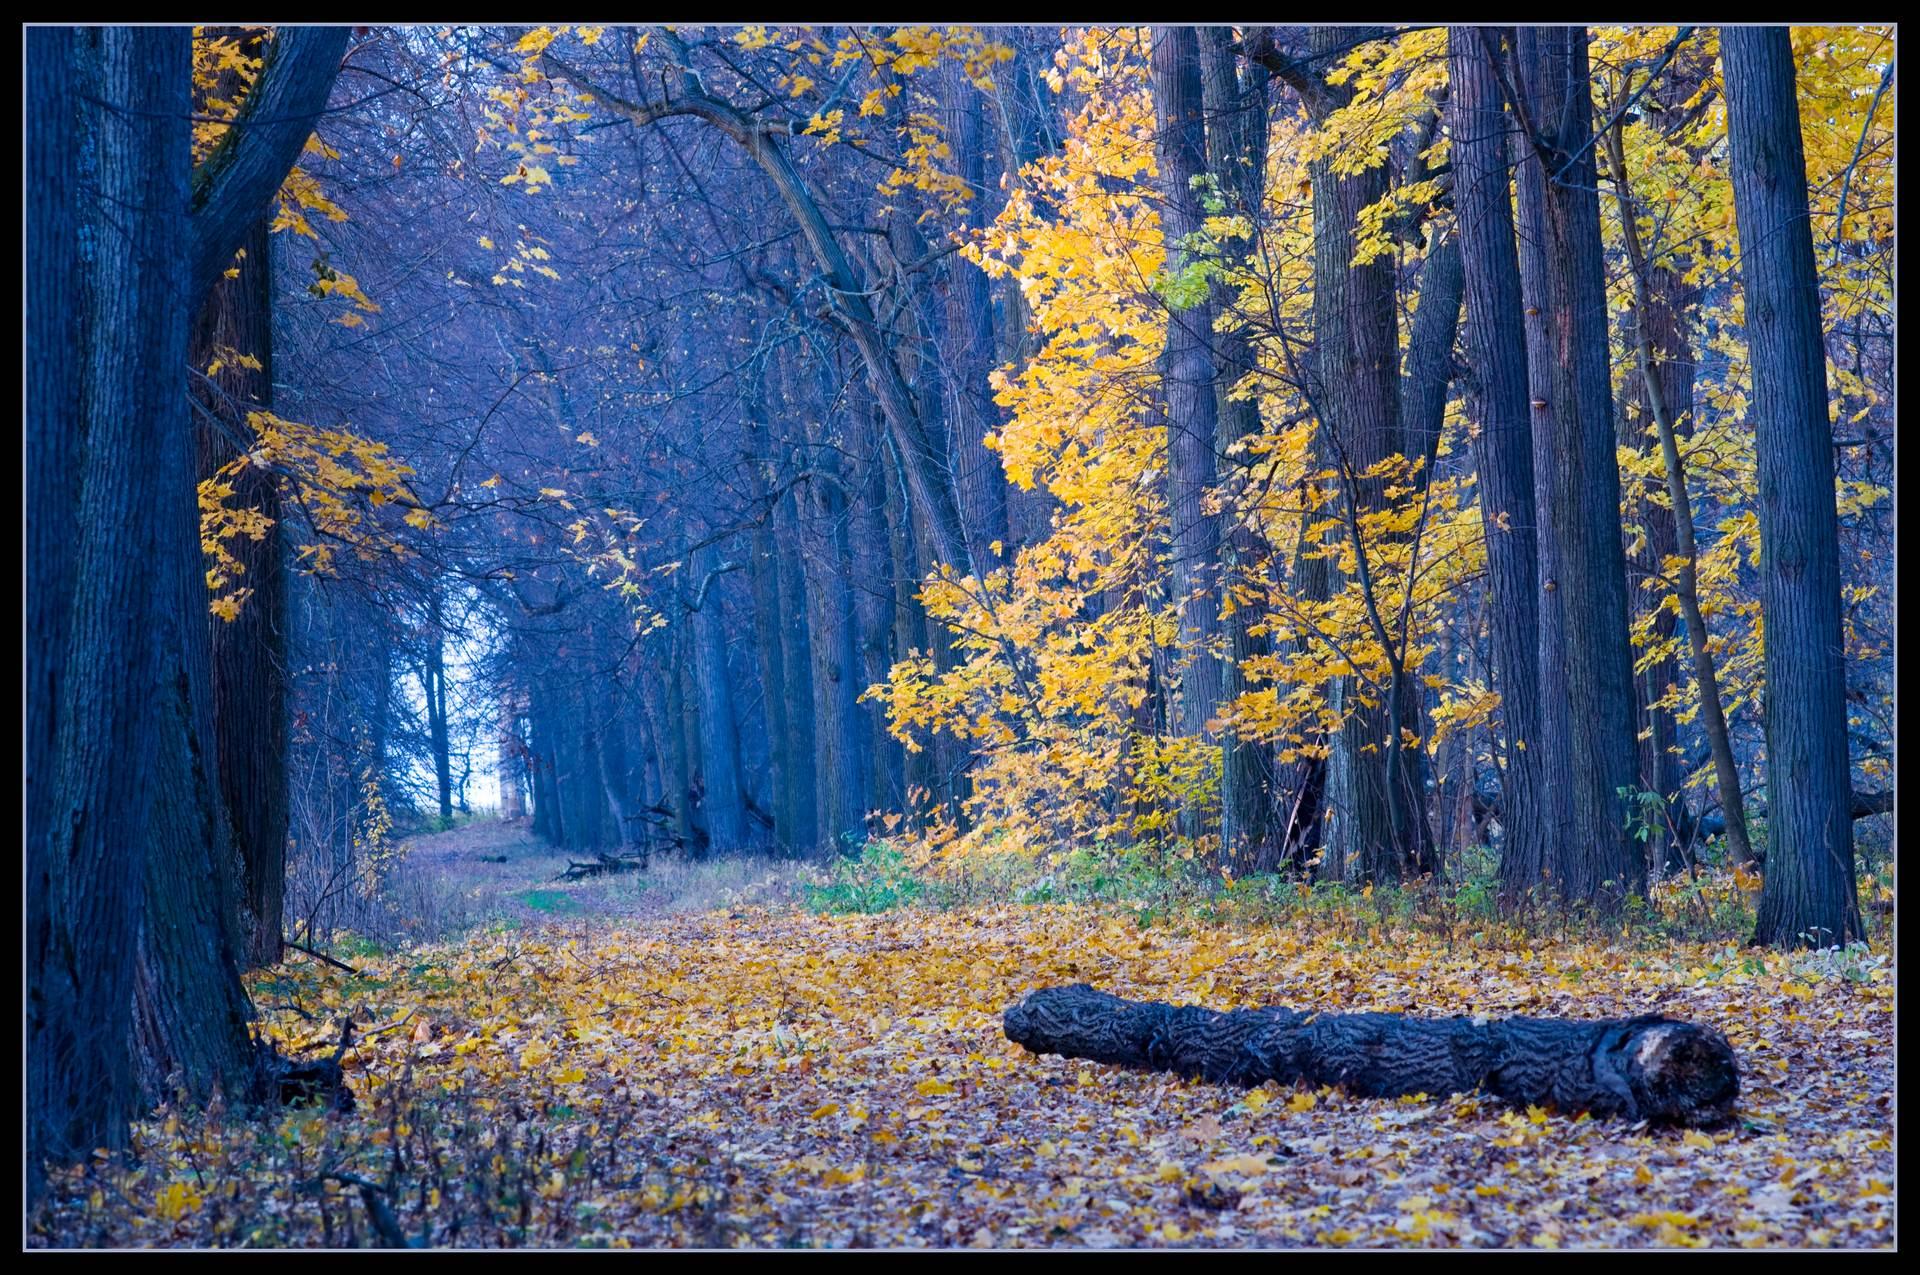 Zakharov_Aleksey_Mysterious wood_B2